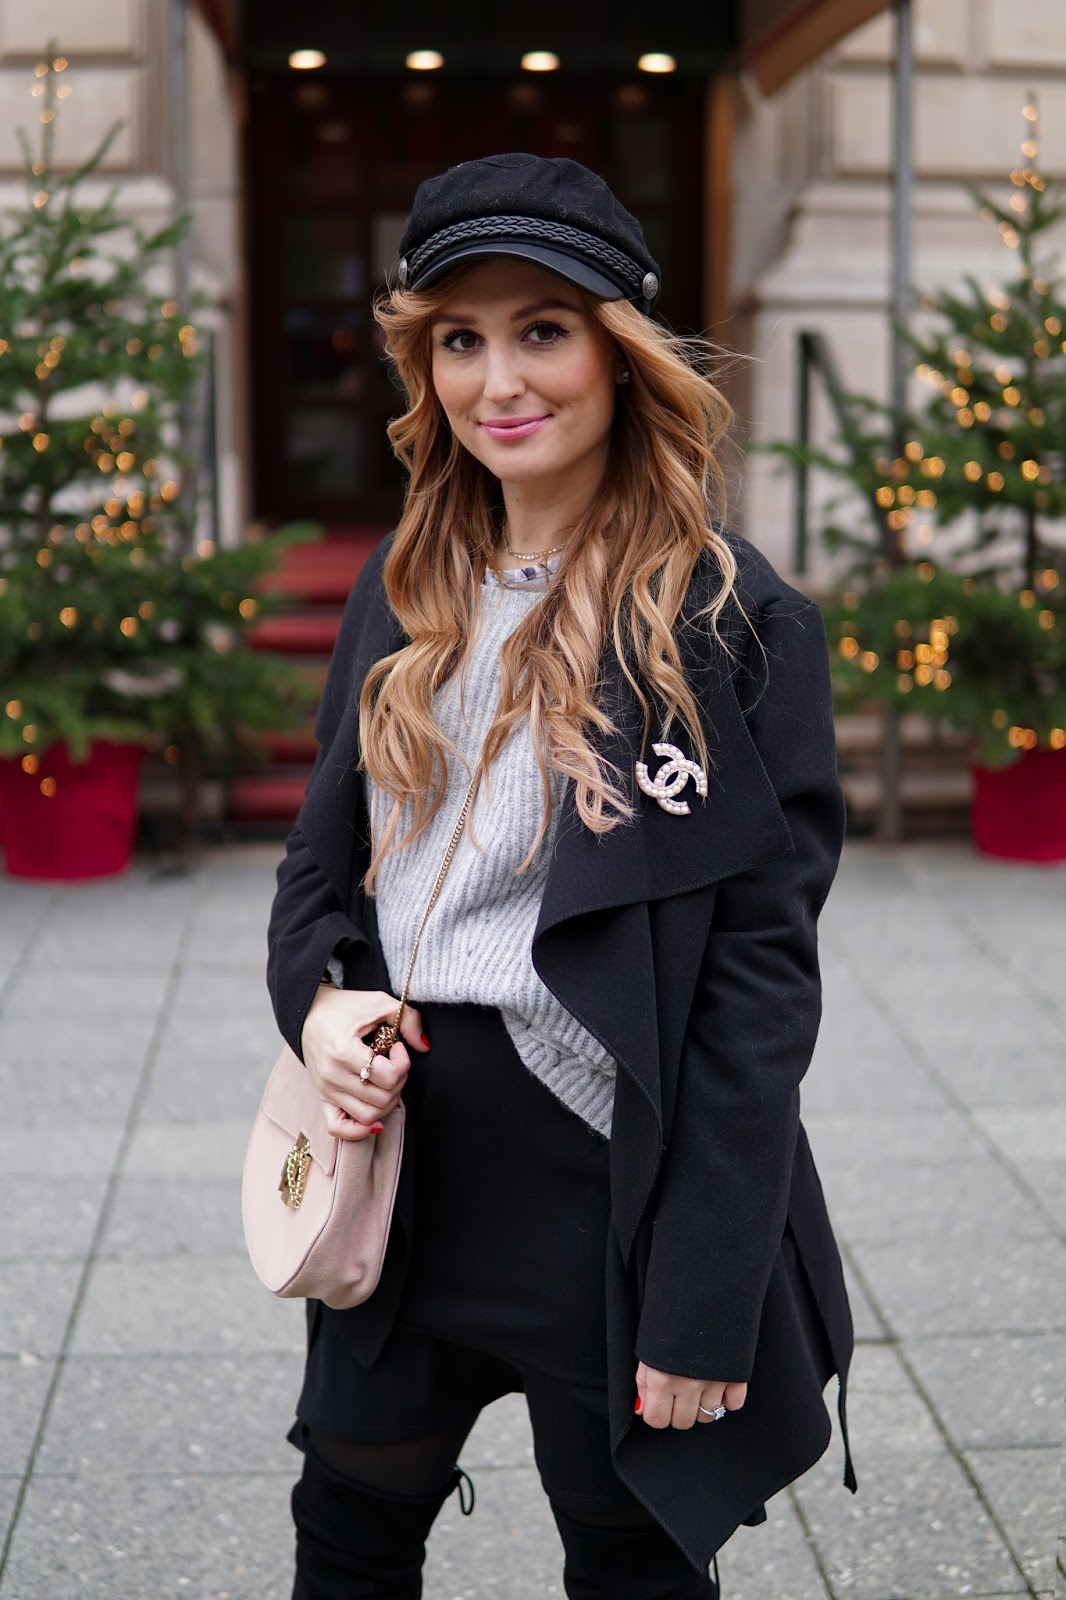 drew-chloe-tasche-in-rosa-zu-schwarze,-mantel-fashionstylebyjohanna-fashionblog-frankfurt-blogger-fashionblogger-bloggerdeutschland-lifestyleblog-modeblog-frankfurt-germanblogger-styleblog-SCHIFFER-MÜTZE-